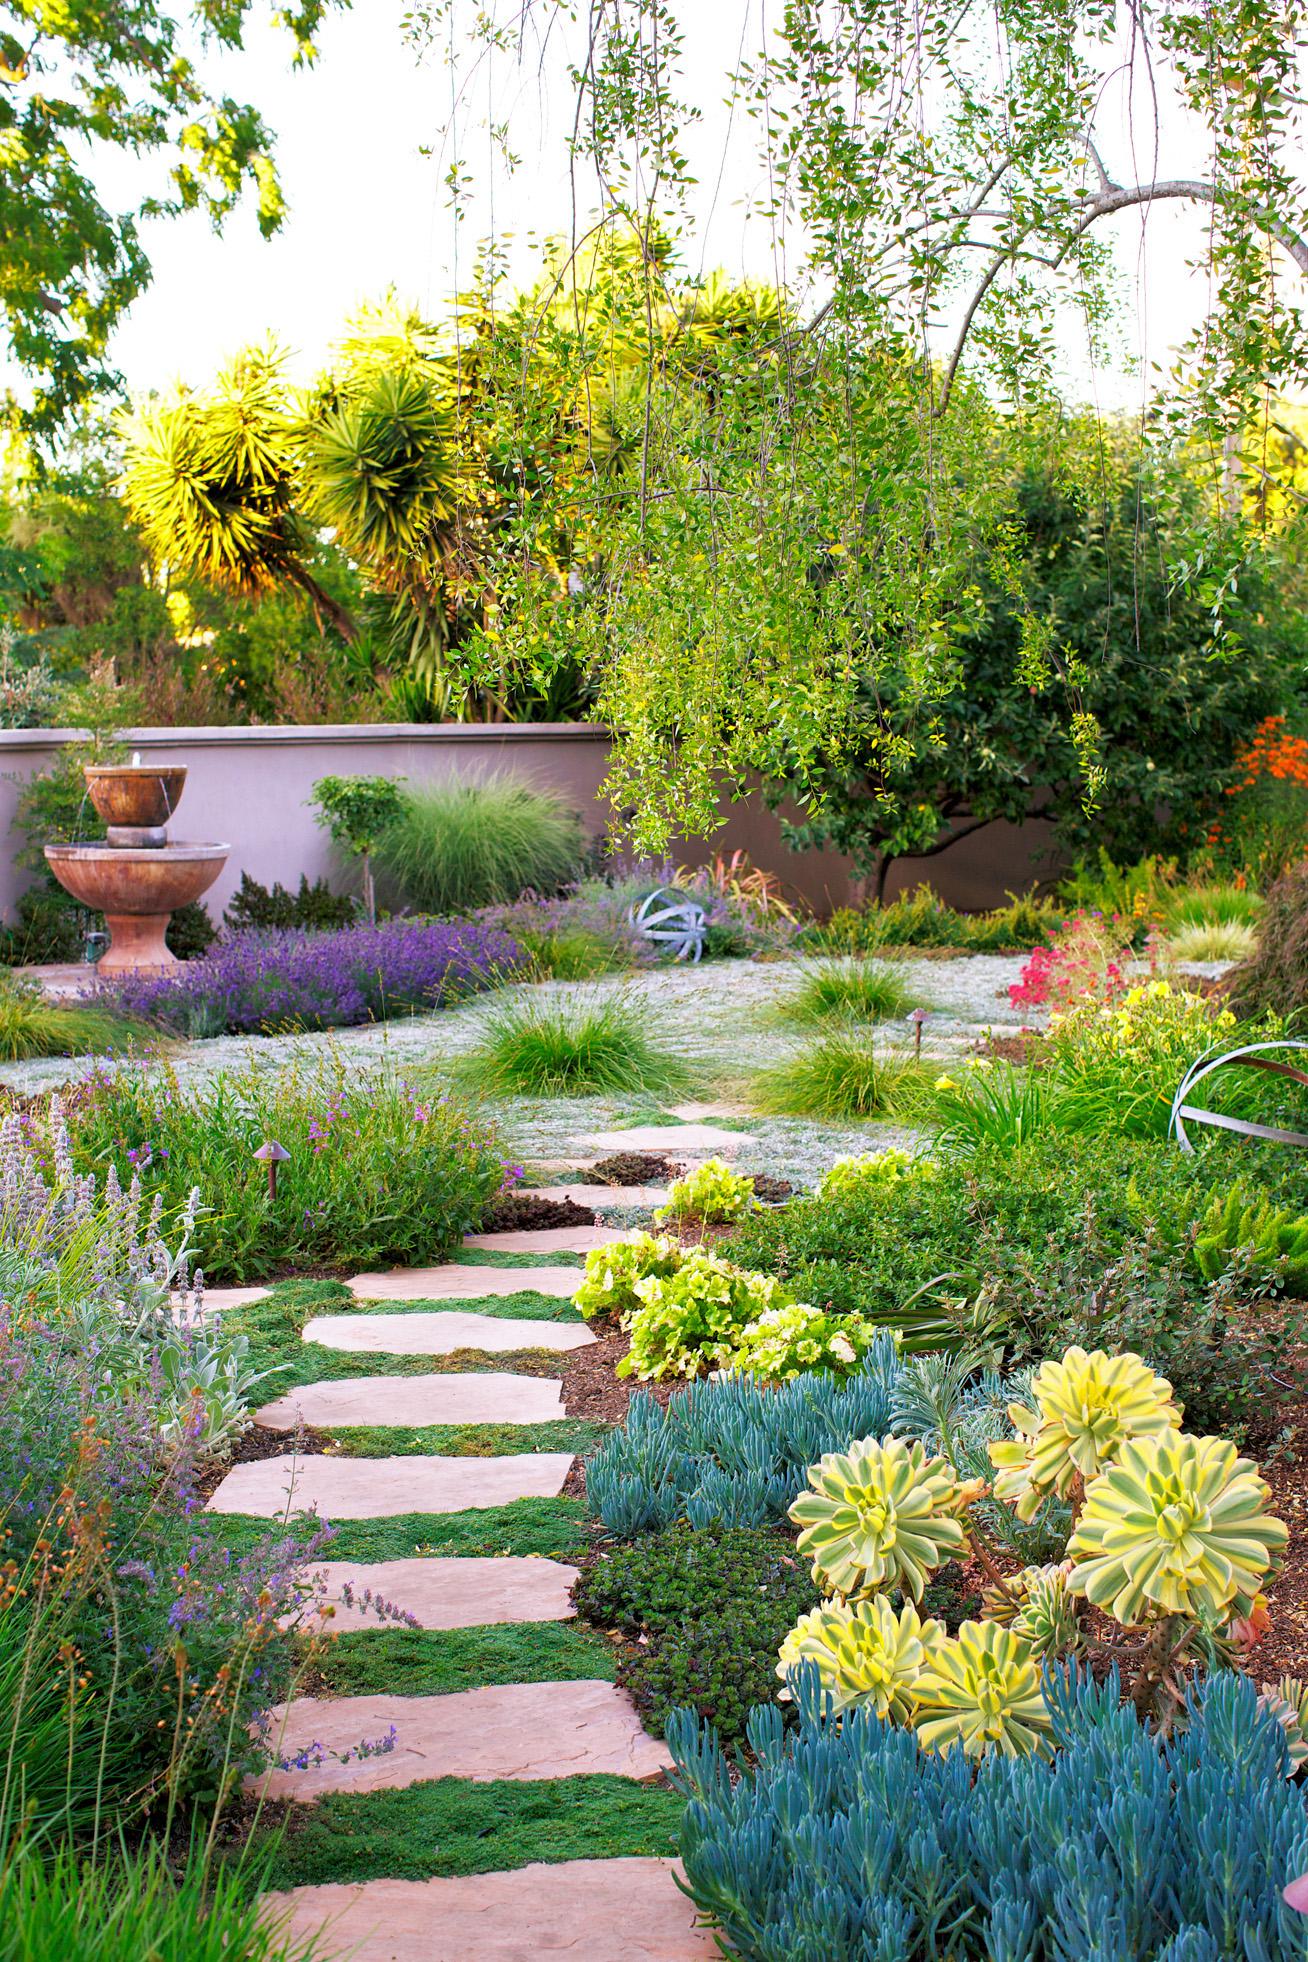 Case study: Wild & romantic - Water-Wise Garden Design Guide - Sunset Magazine